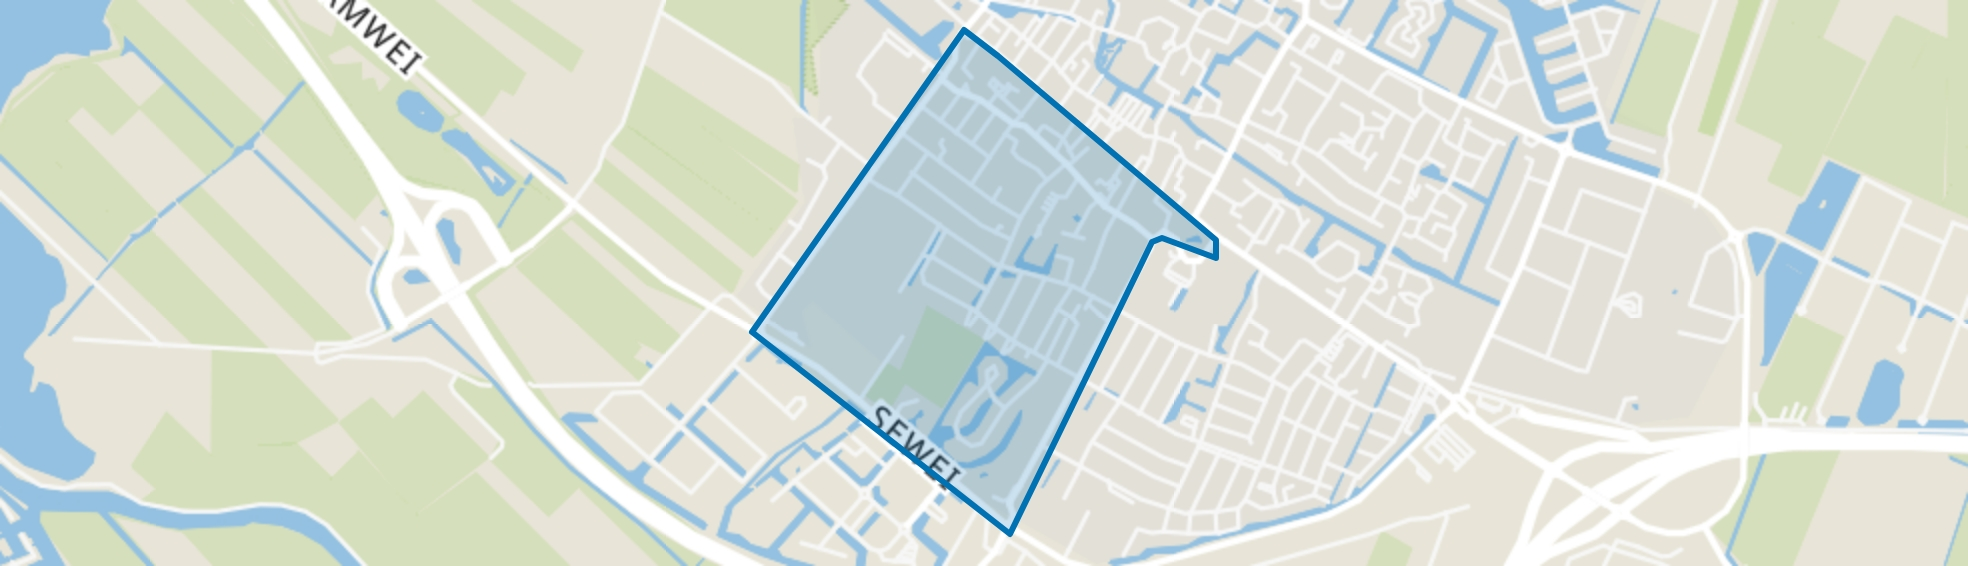 Joure, Blaauwhof, Joure map